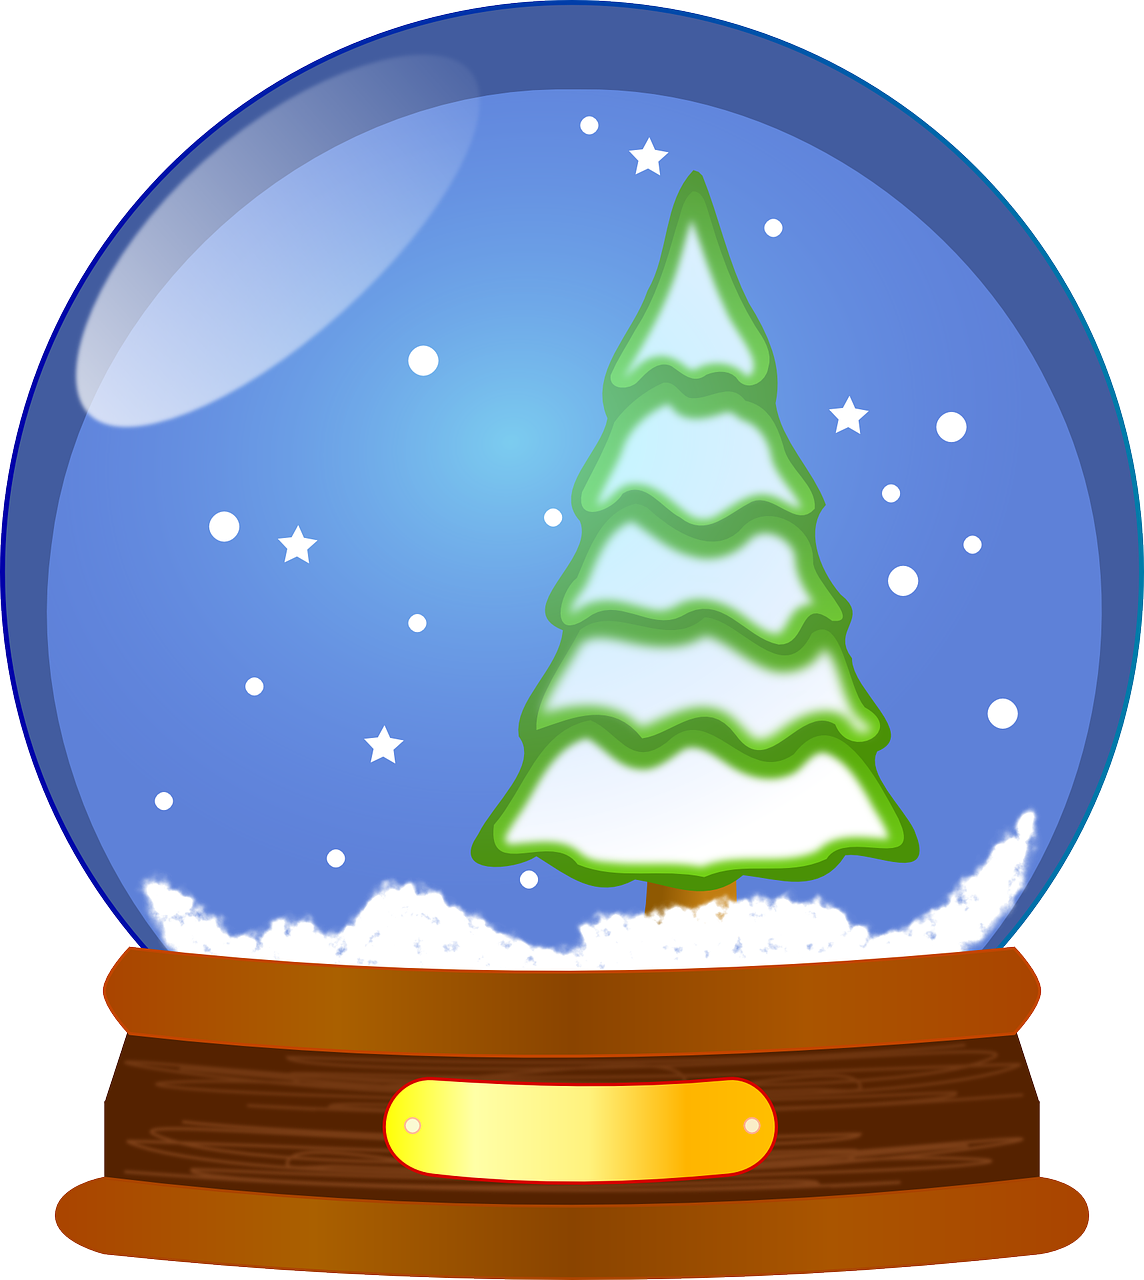 Free Image On Pixabay Snow Globe Waterglobe Snowstorm Christmas Snow Globes Snow Globes Holiday Postcards